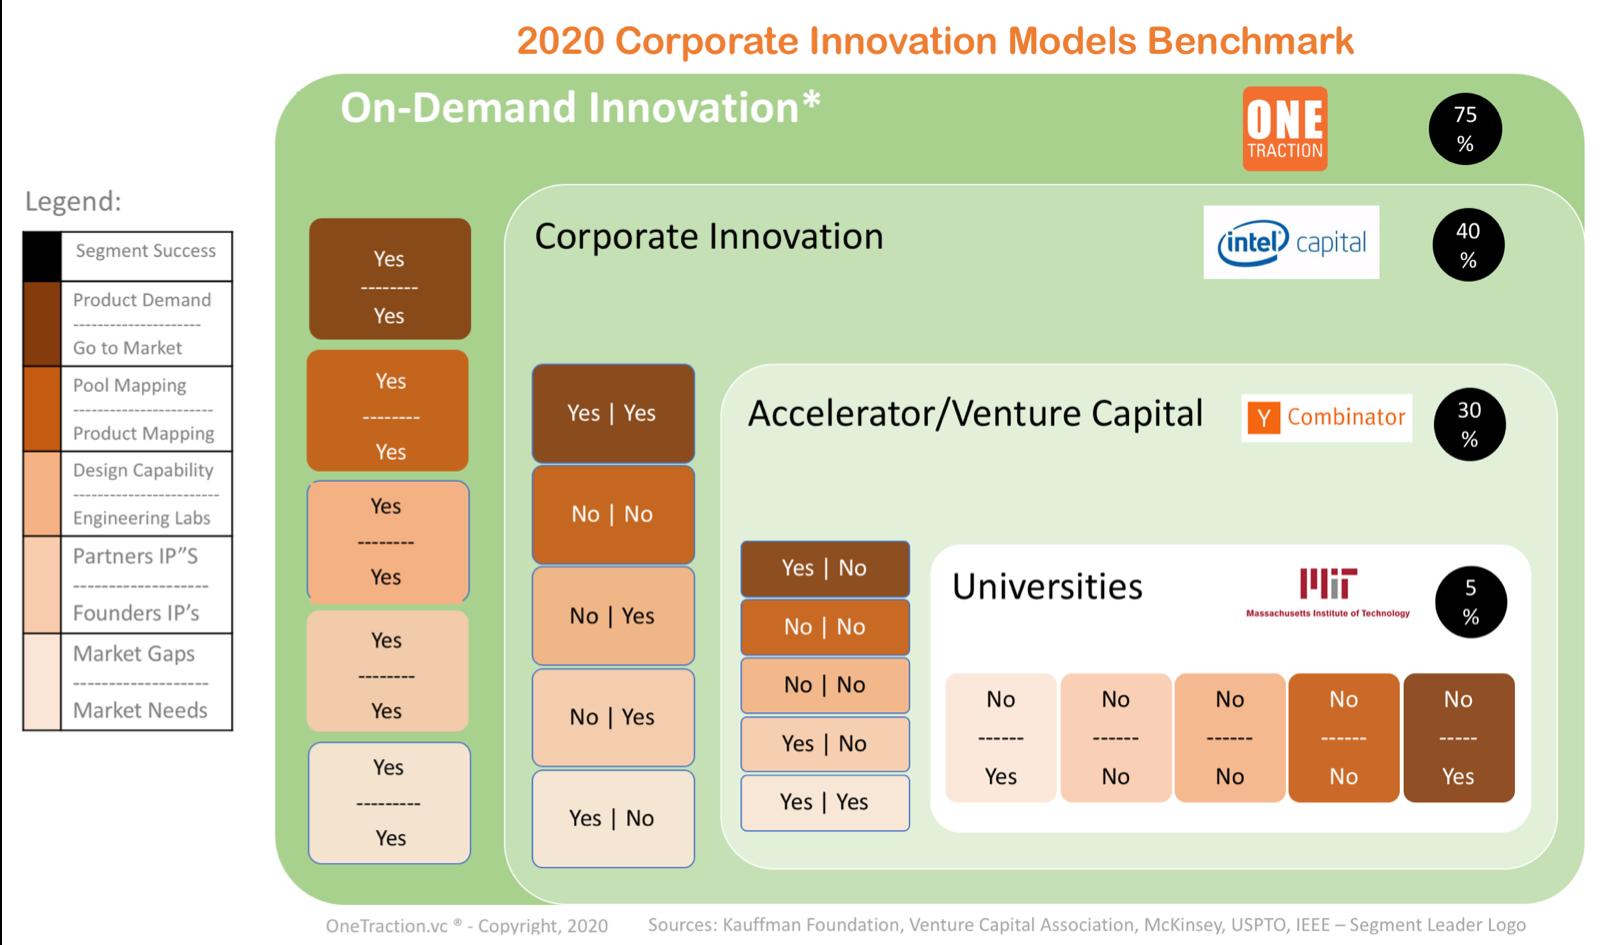 Figure 2: Corporate Innovation Models